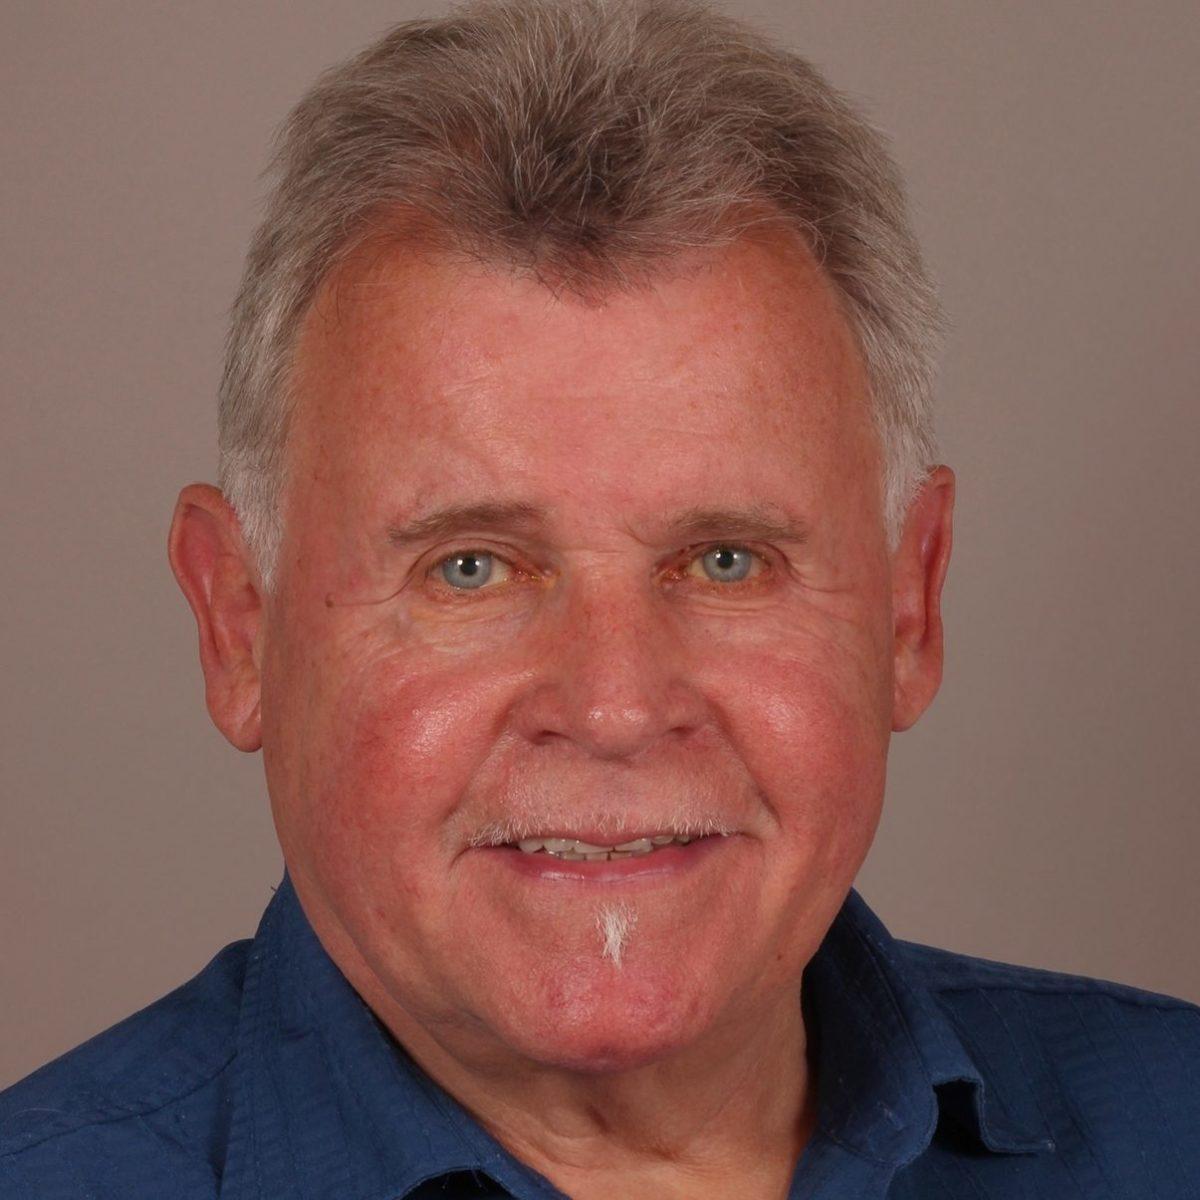 Heinz Koderhold